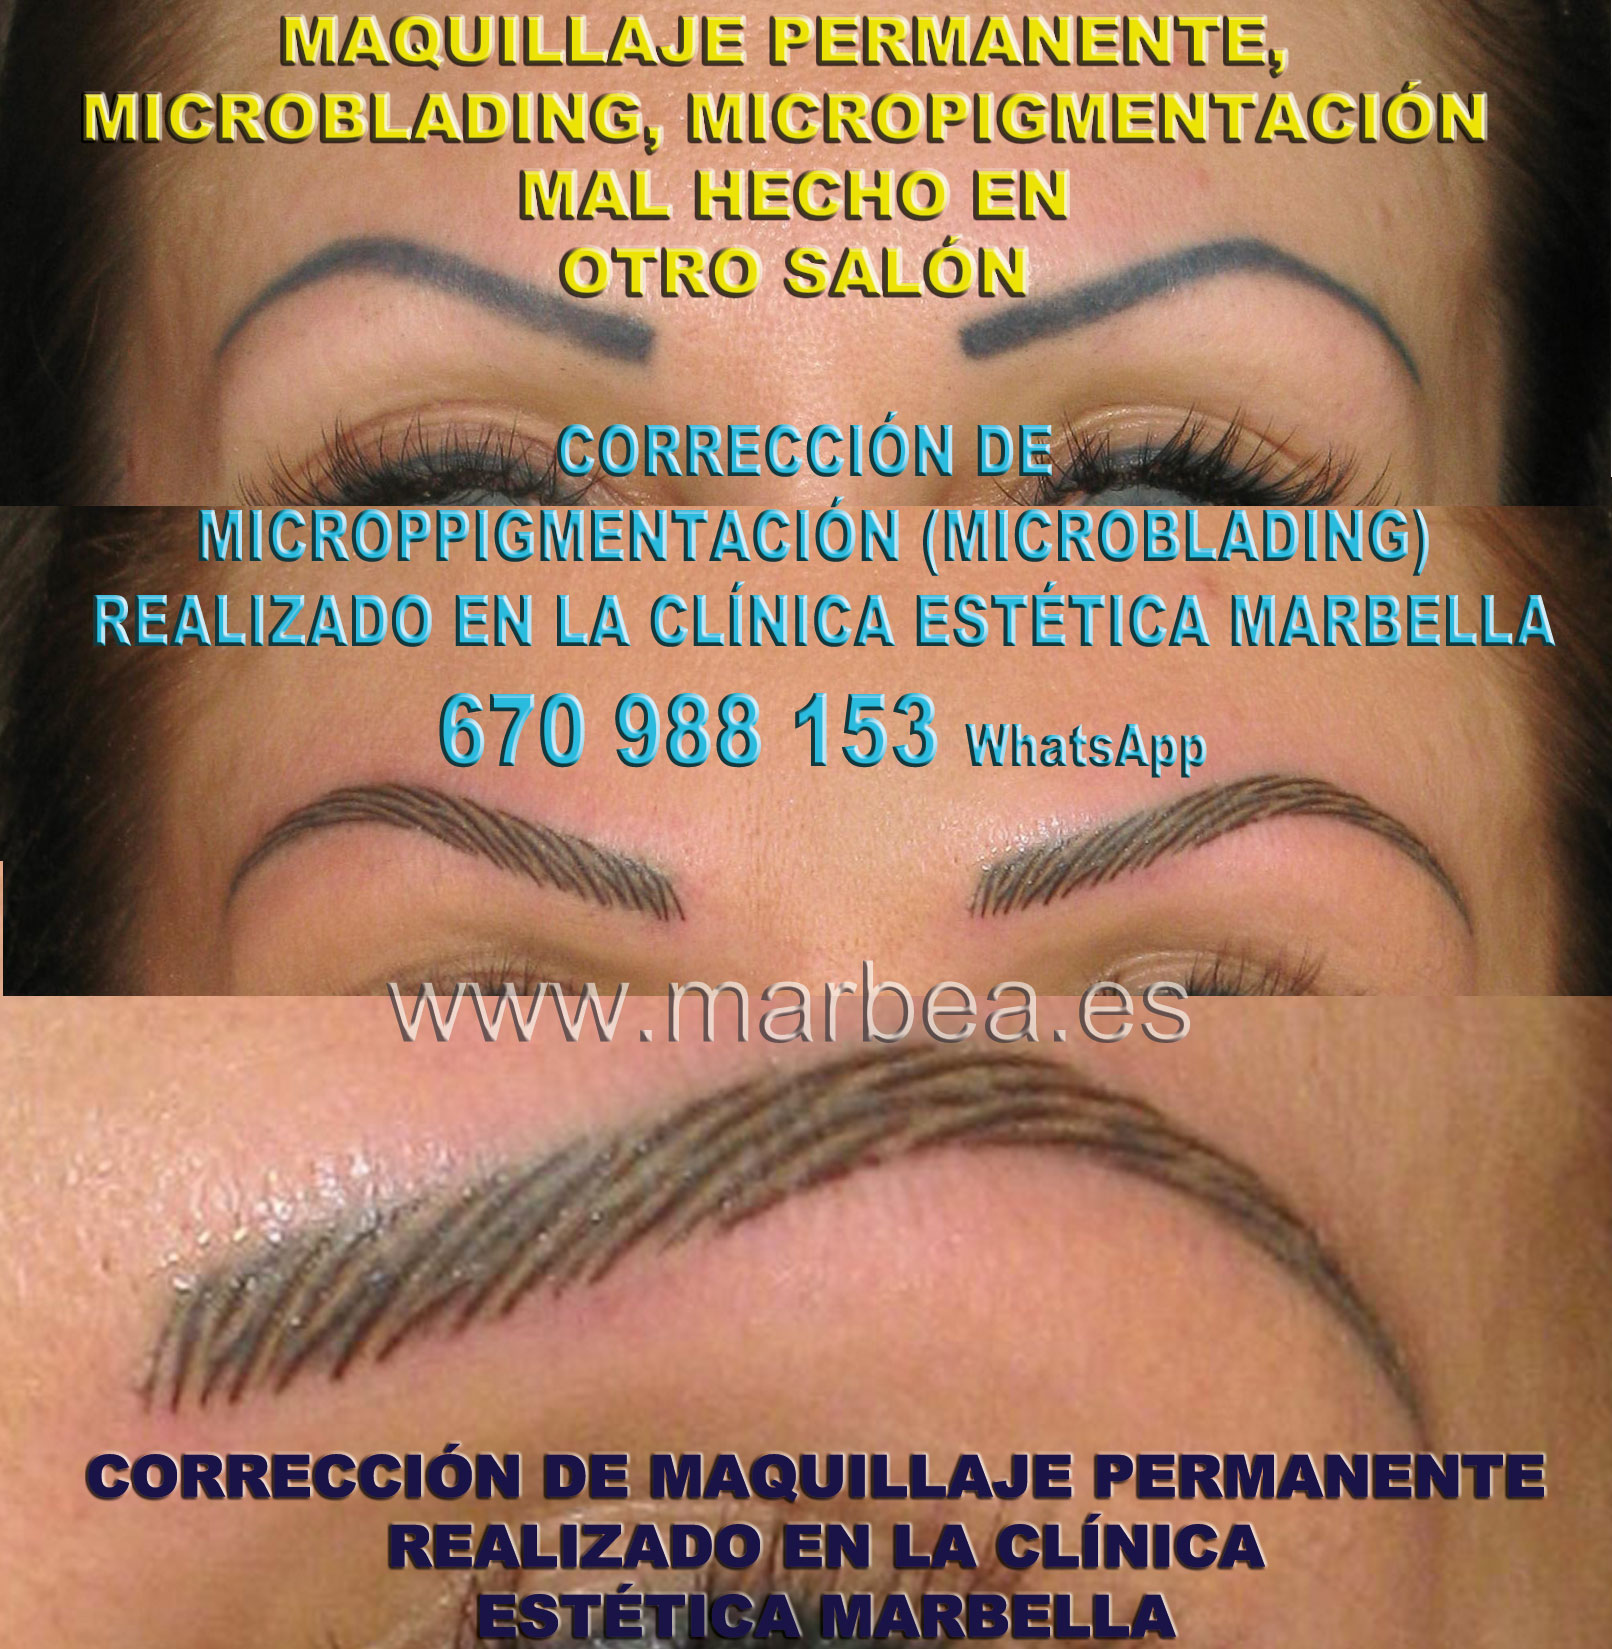 CORREGIR TATUAJE DE CEJAS clínica estética maquillaje semipermanente ofrenda corrección de micropigmentación en cejas,micropigmentación correctiva cejas mal hecha